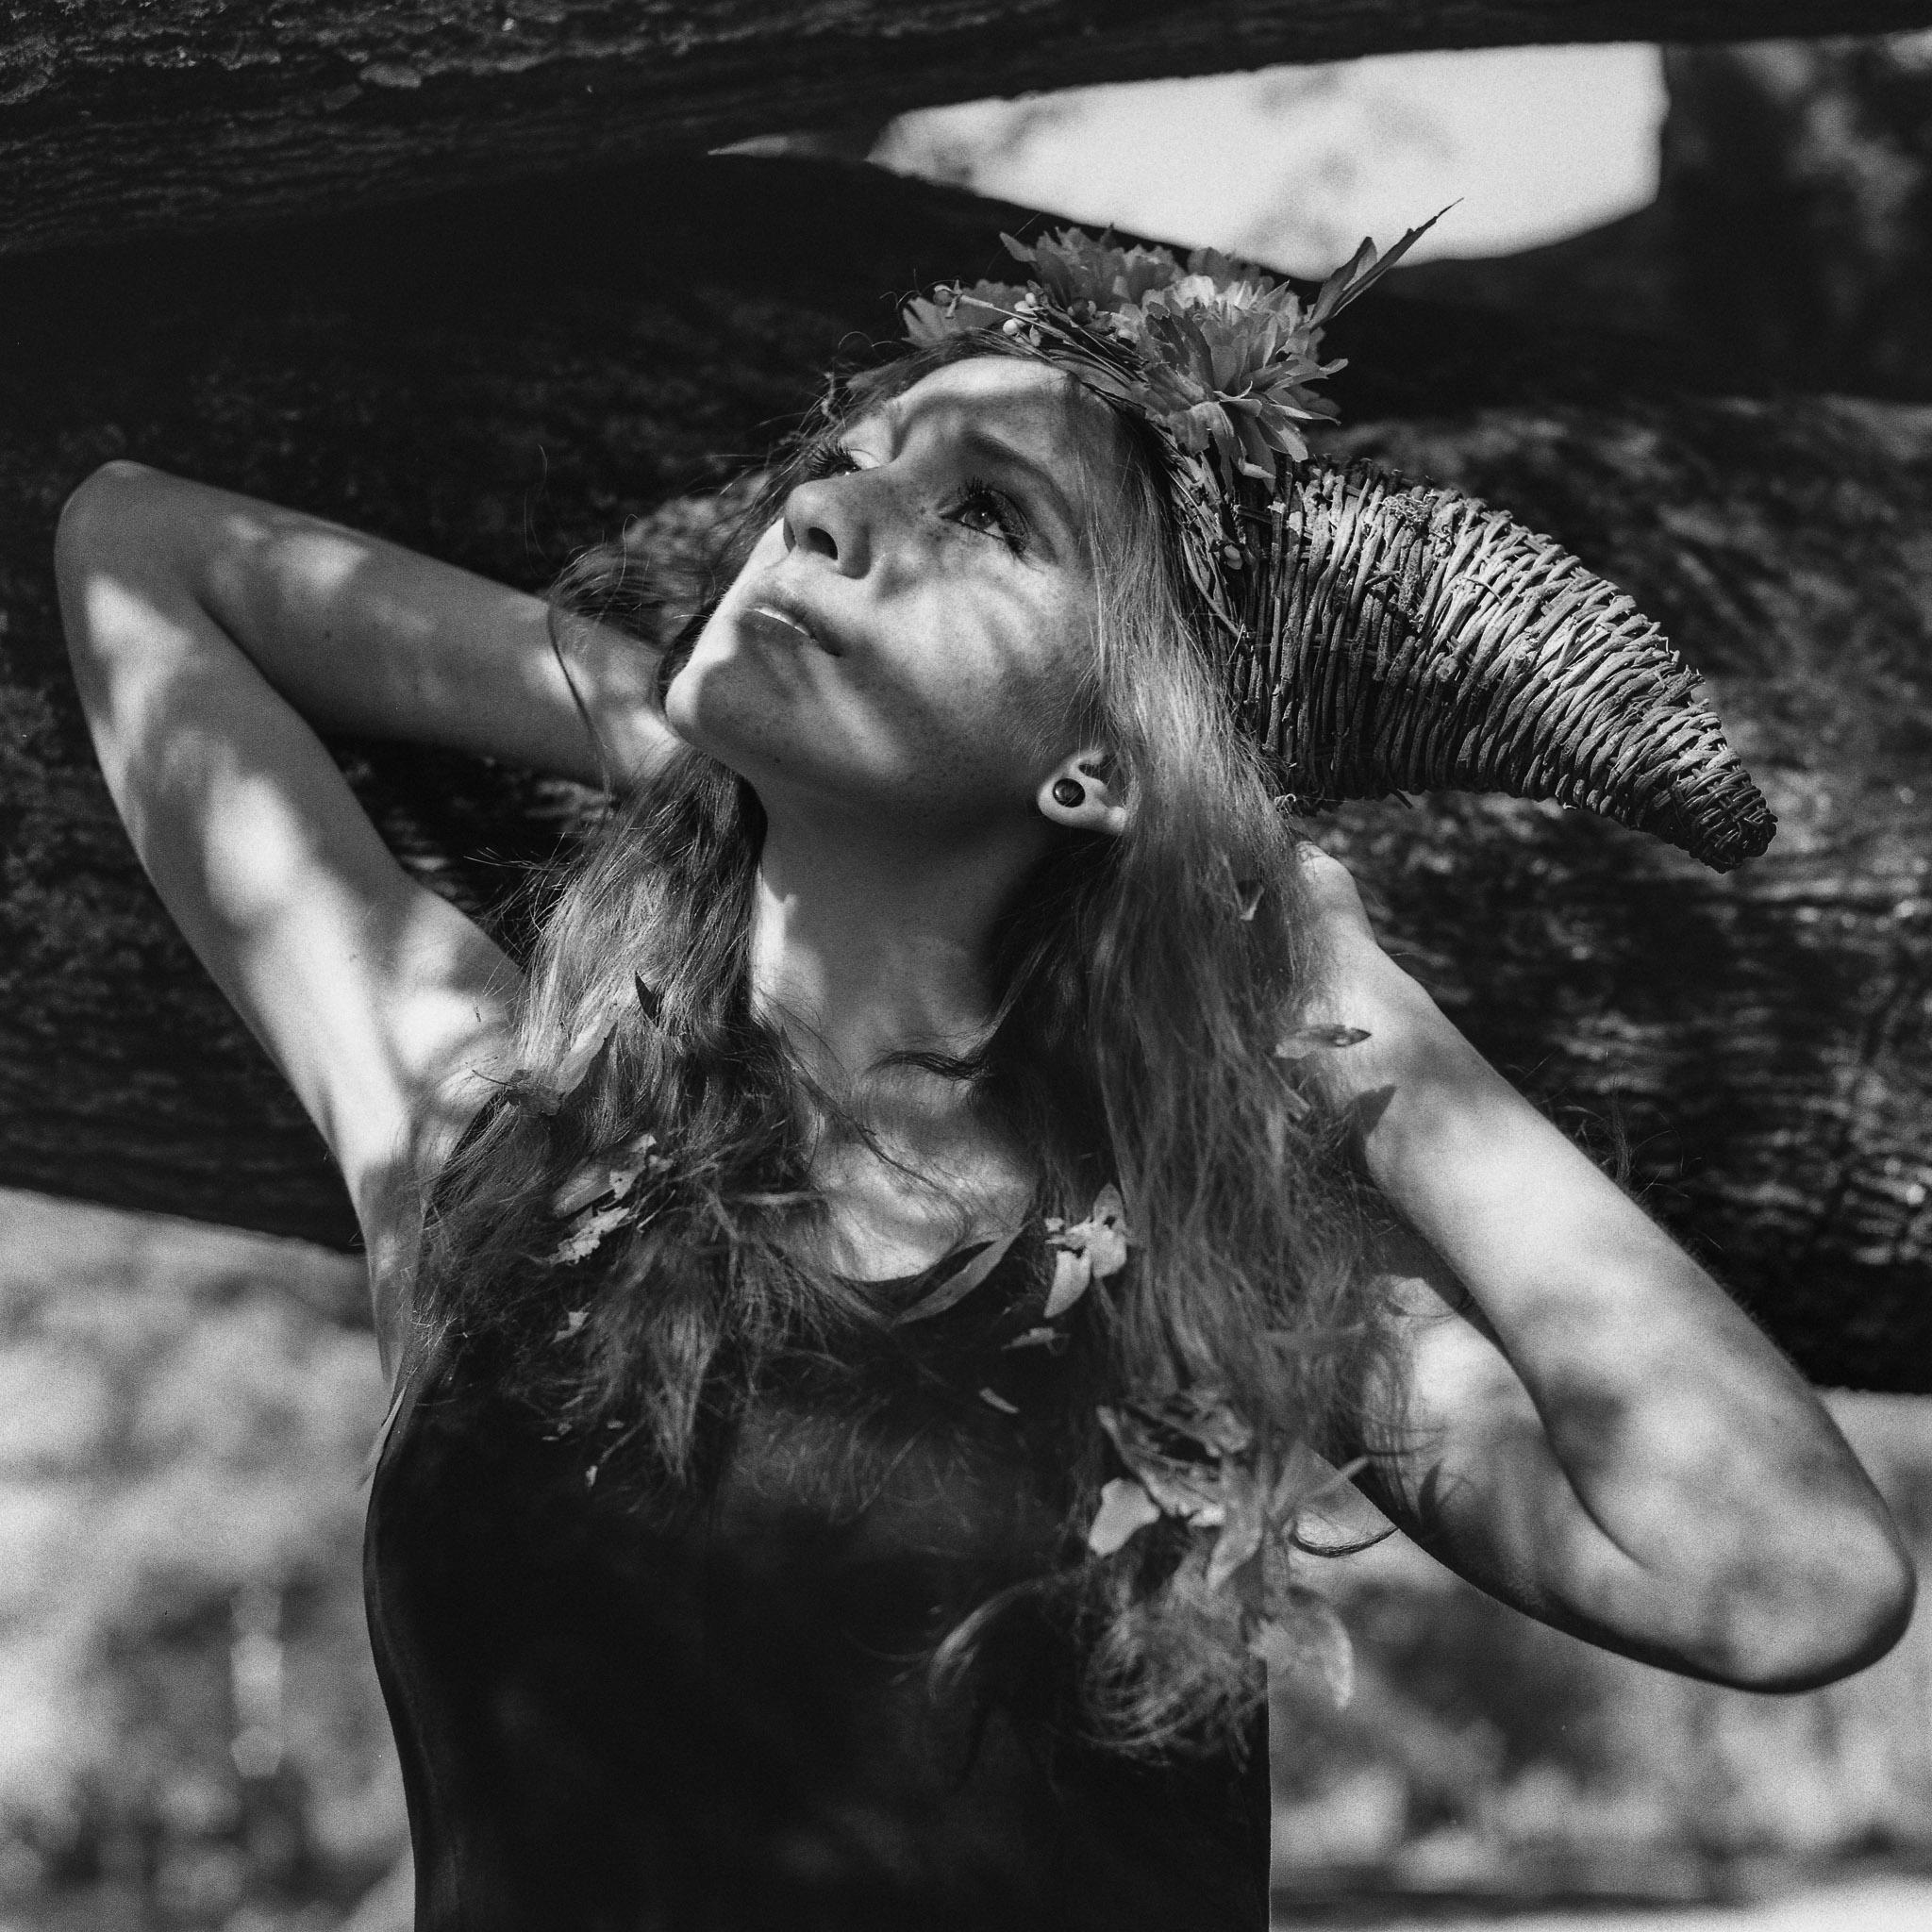 Model: Meagan Hamilton  Camera: Hasselblad 501CM  Film: HP5+